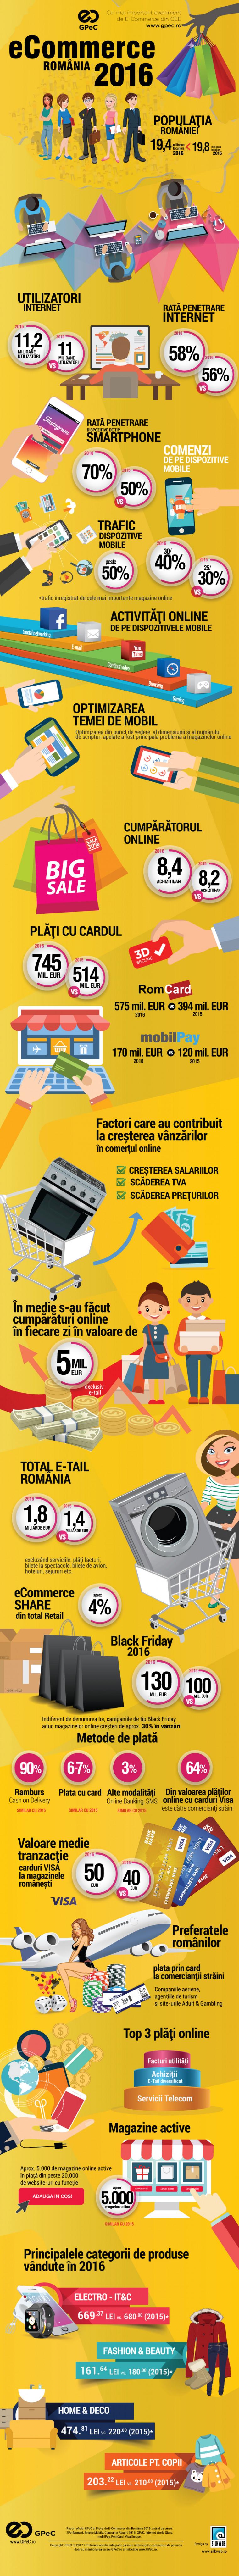 Sinteza-pietei-de-e-commerce-romania-2016-infografic-full